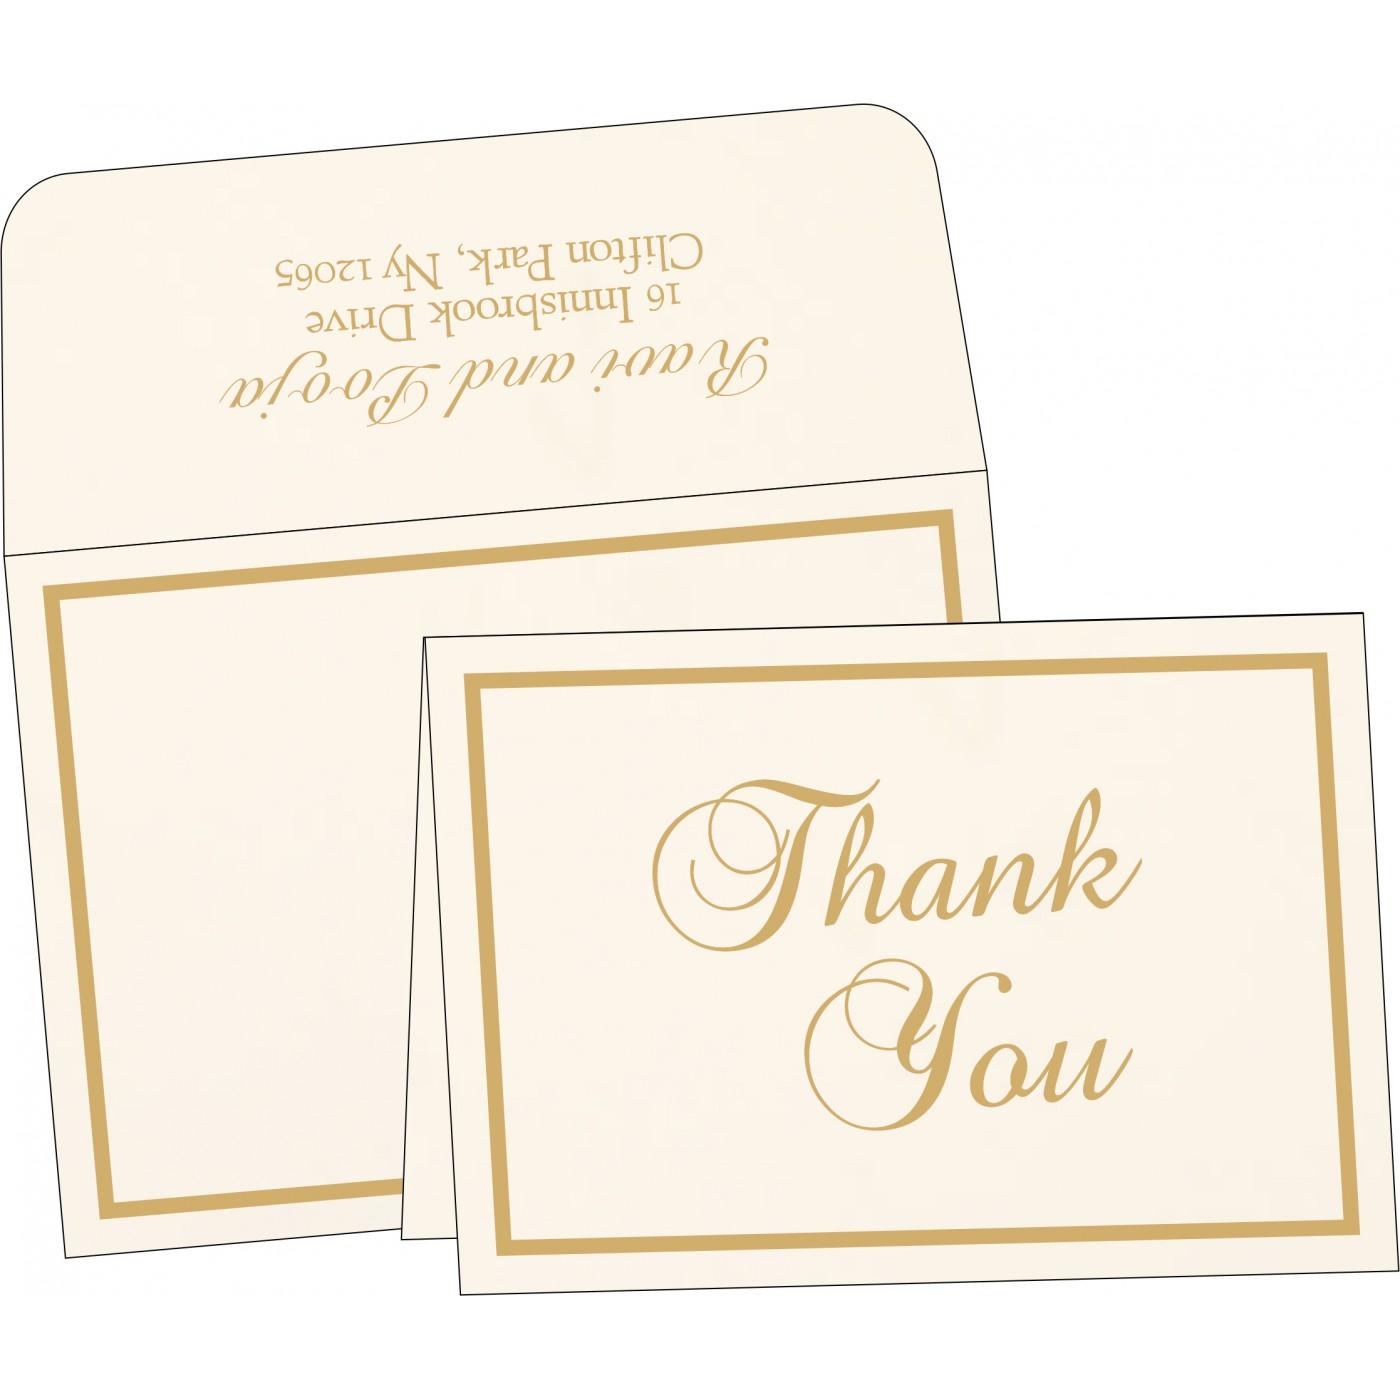 Thank You Cards : TYC-1144 - 123WeddingCards